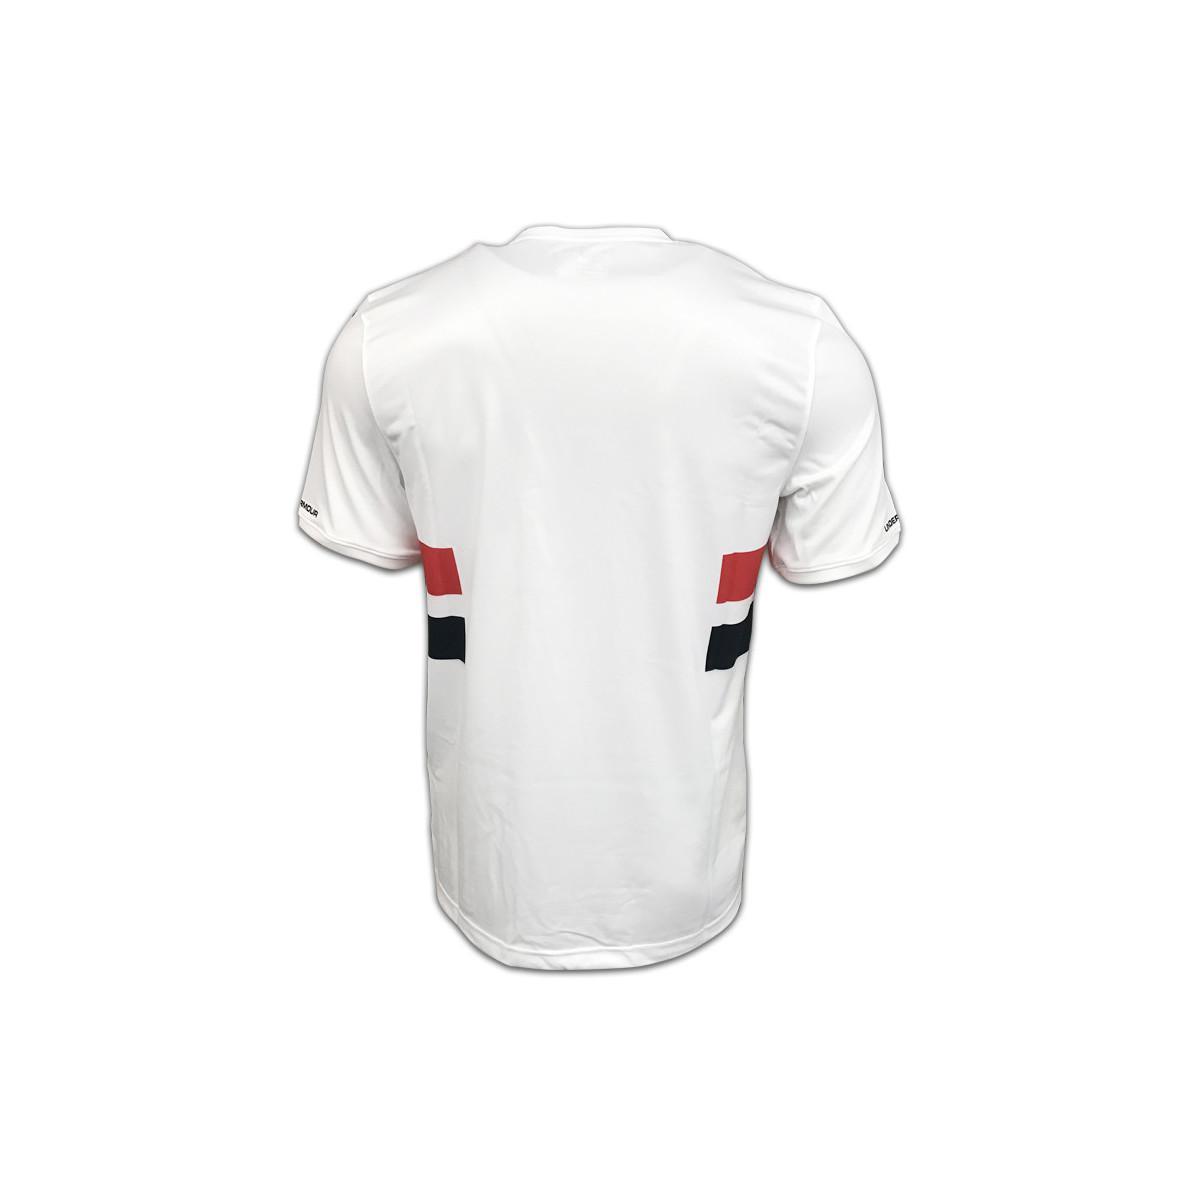 552b0c19b Under Armour 2017-2018 Sao Paolo Home Football Shirt Men s T Shirt ...